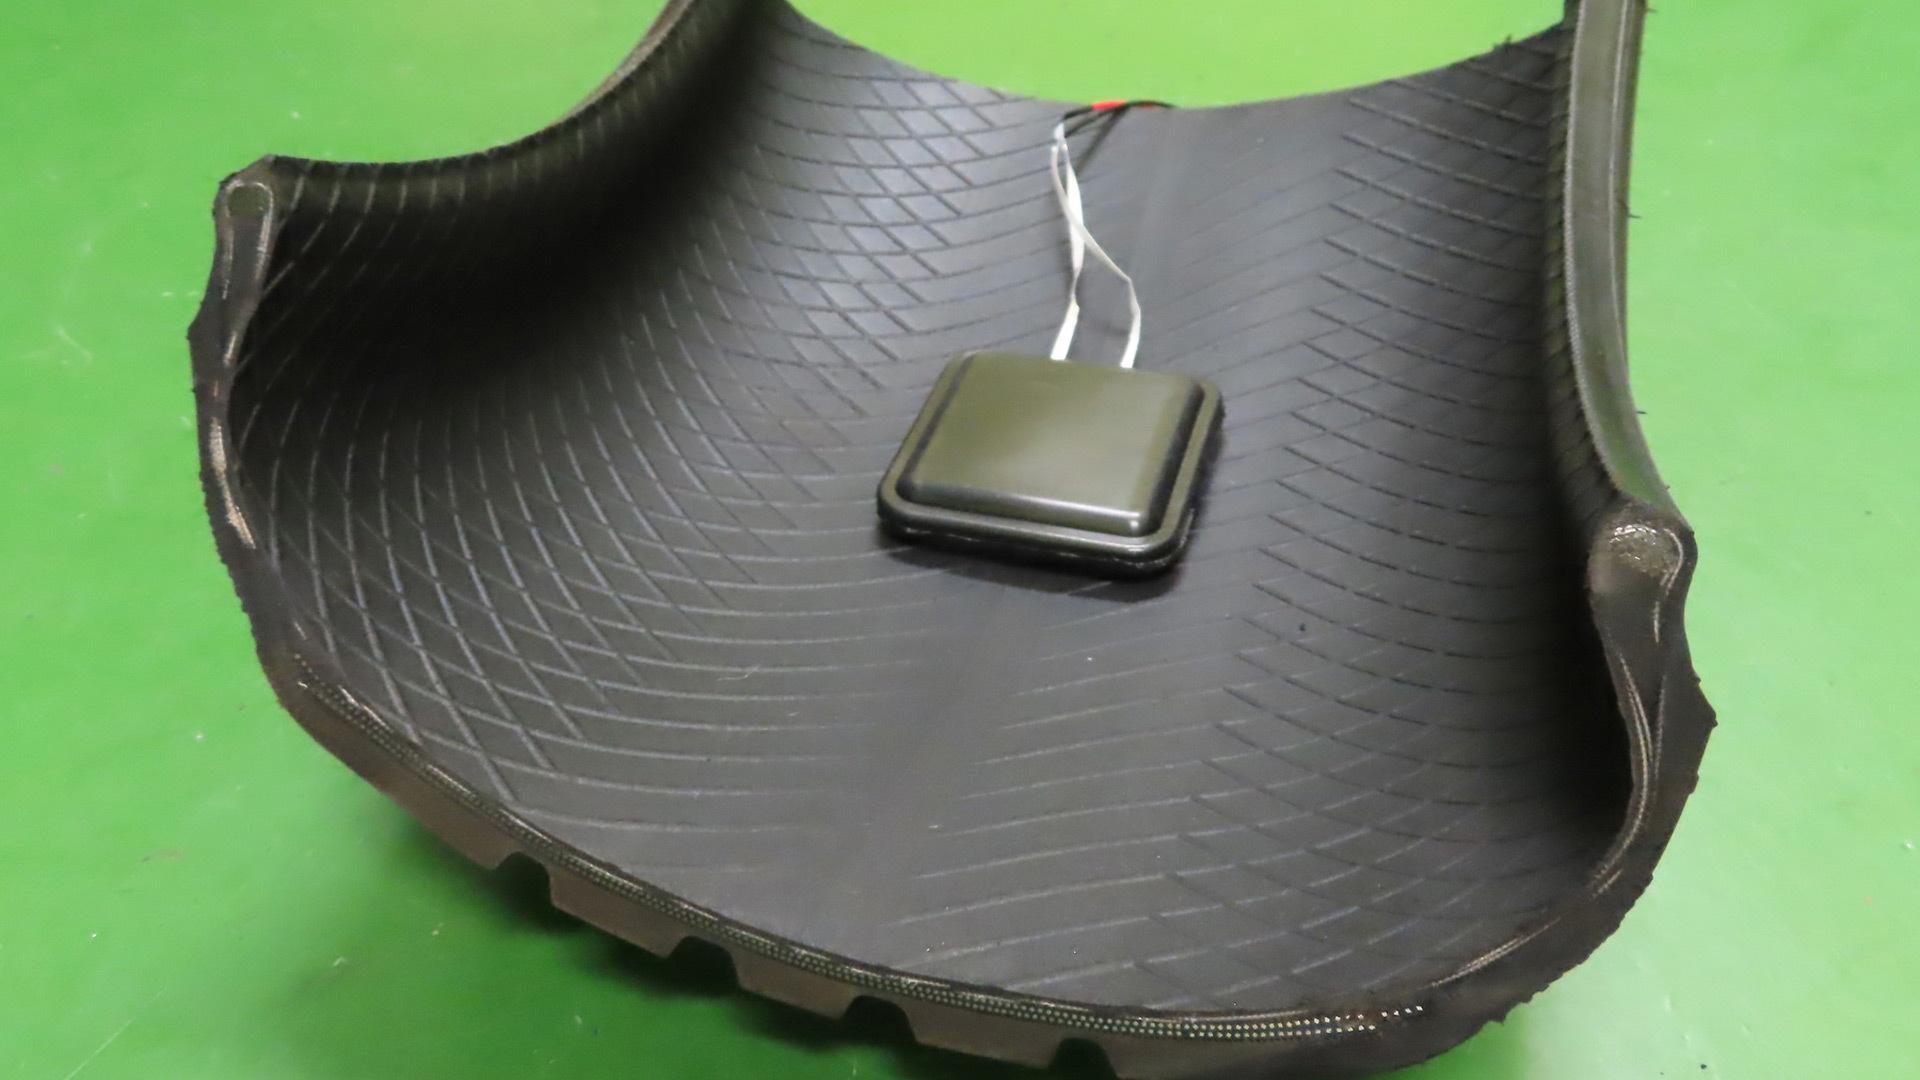 Sumitomo electricity-generating tire concept